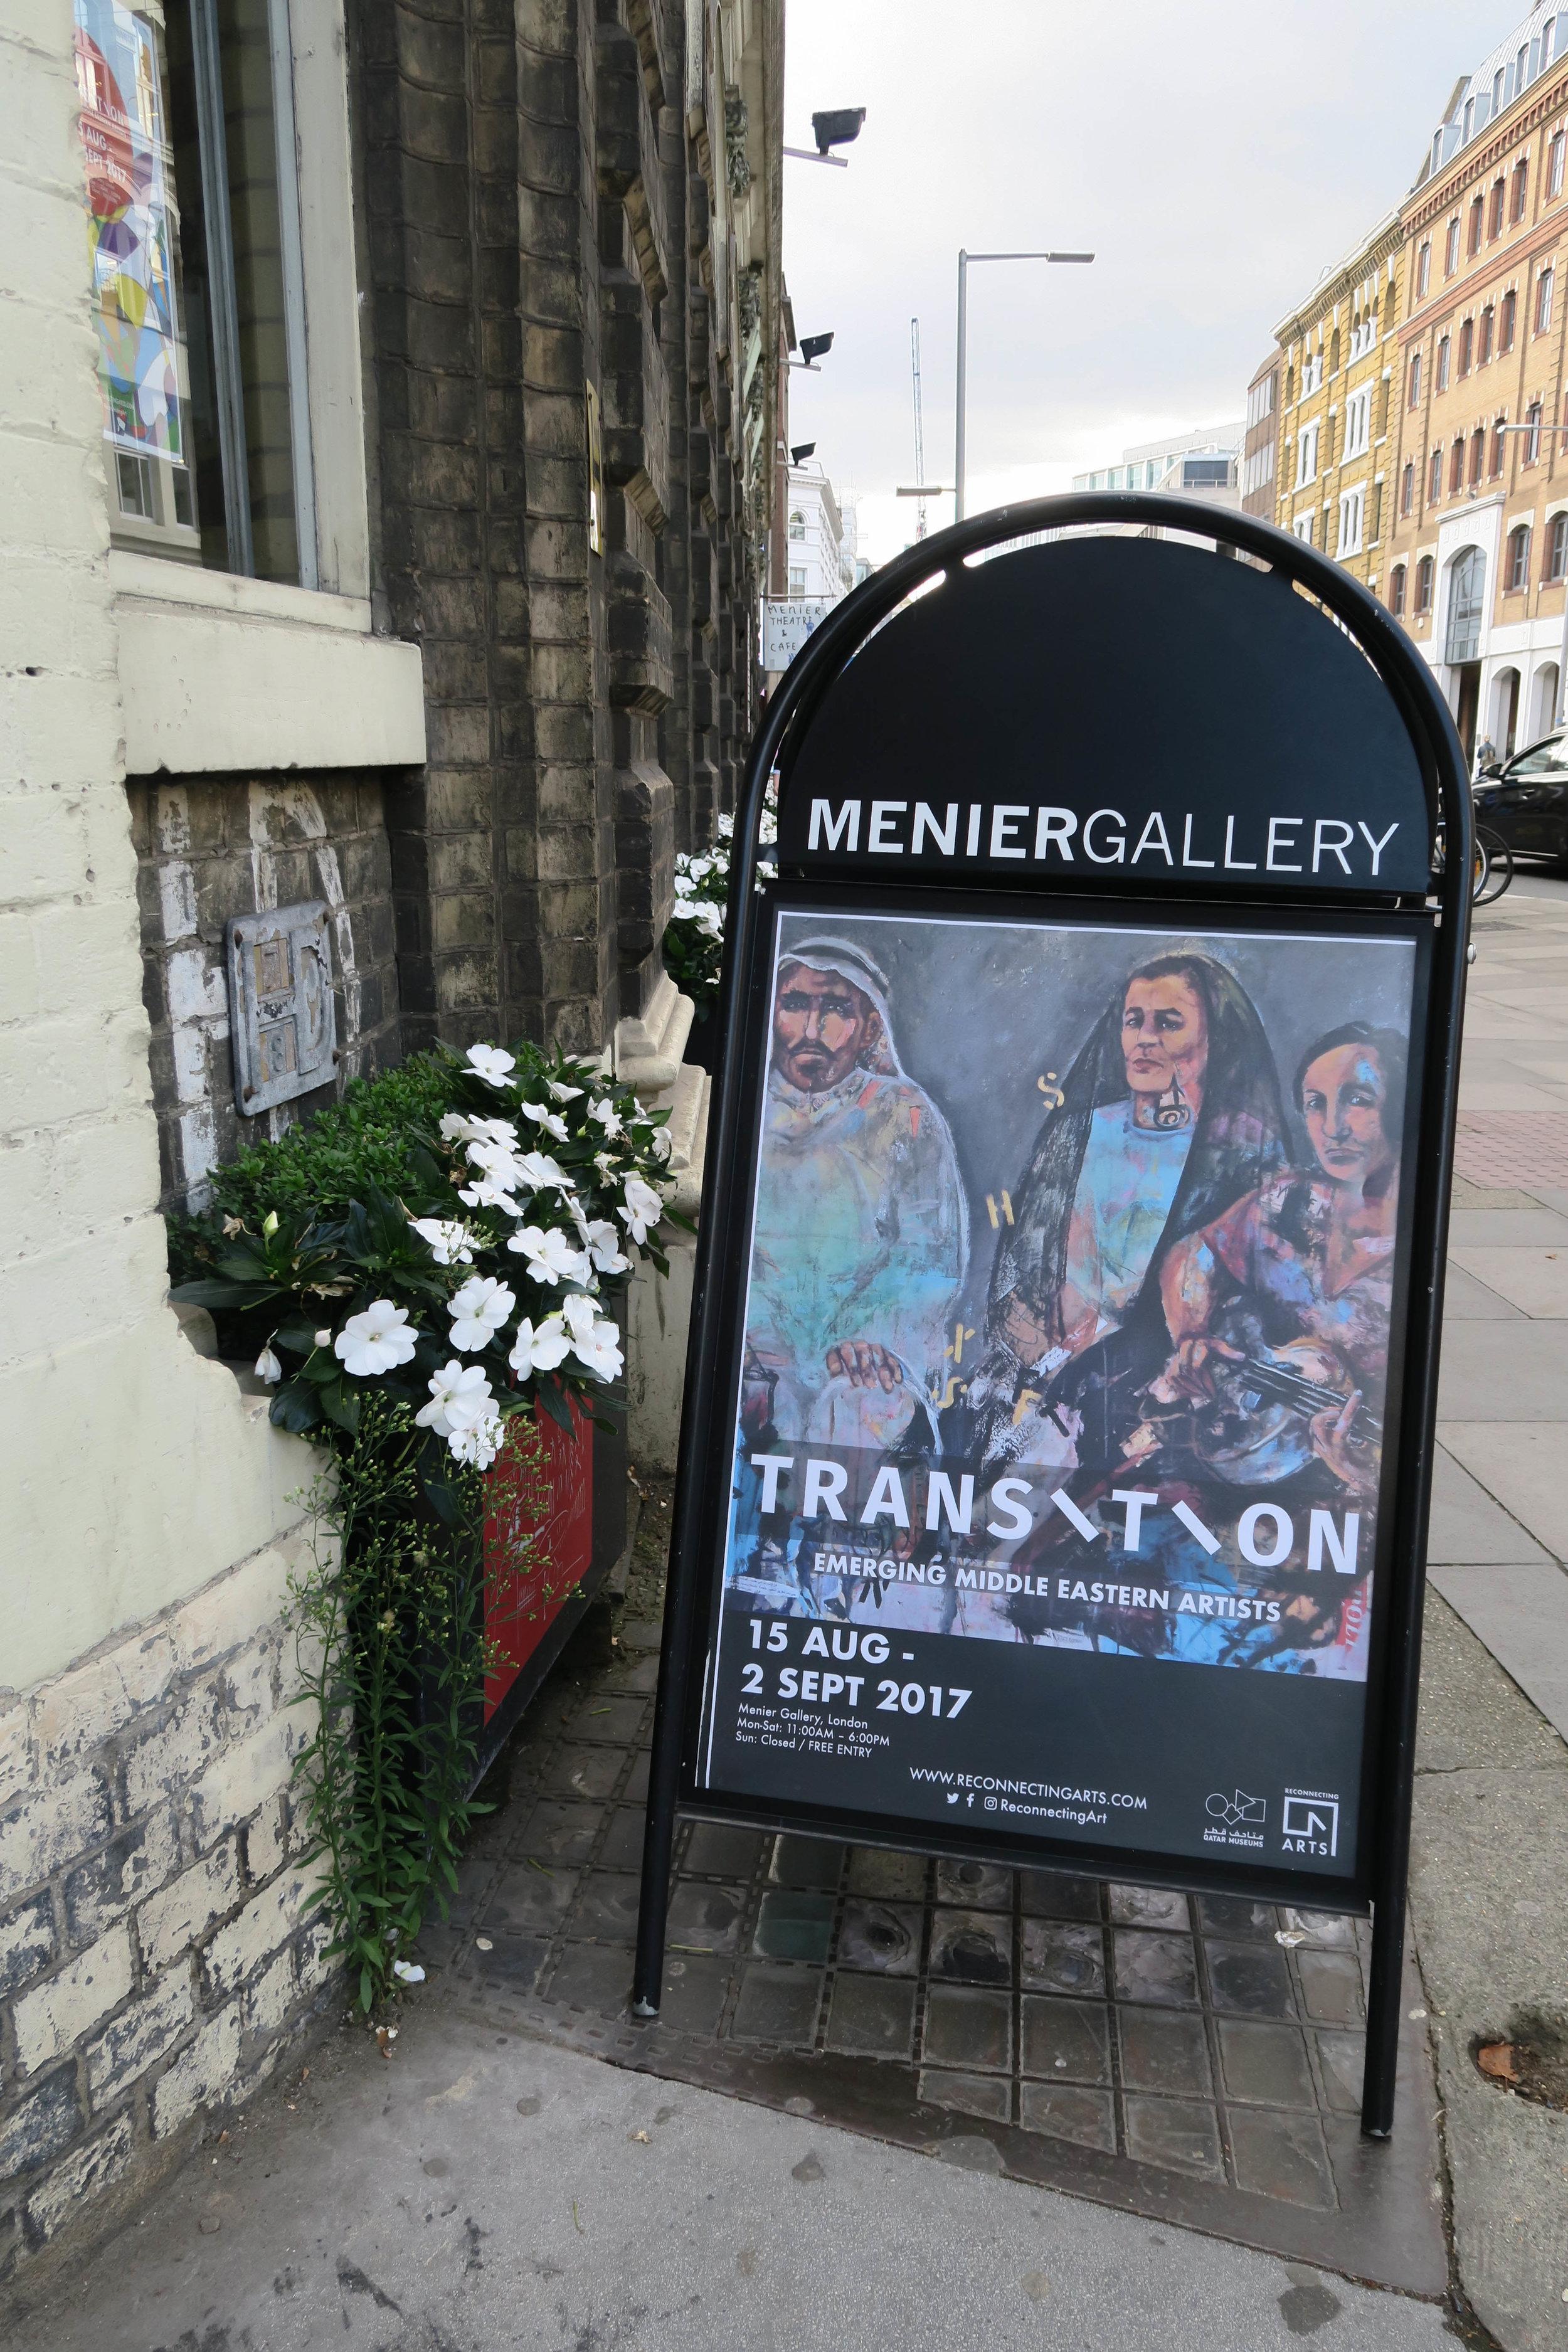 Transition Exhibition in Menier Gallery